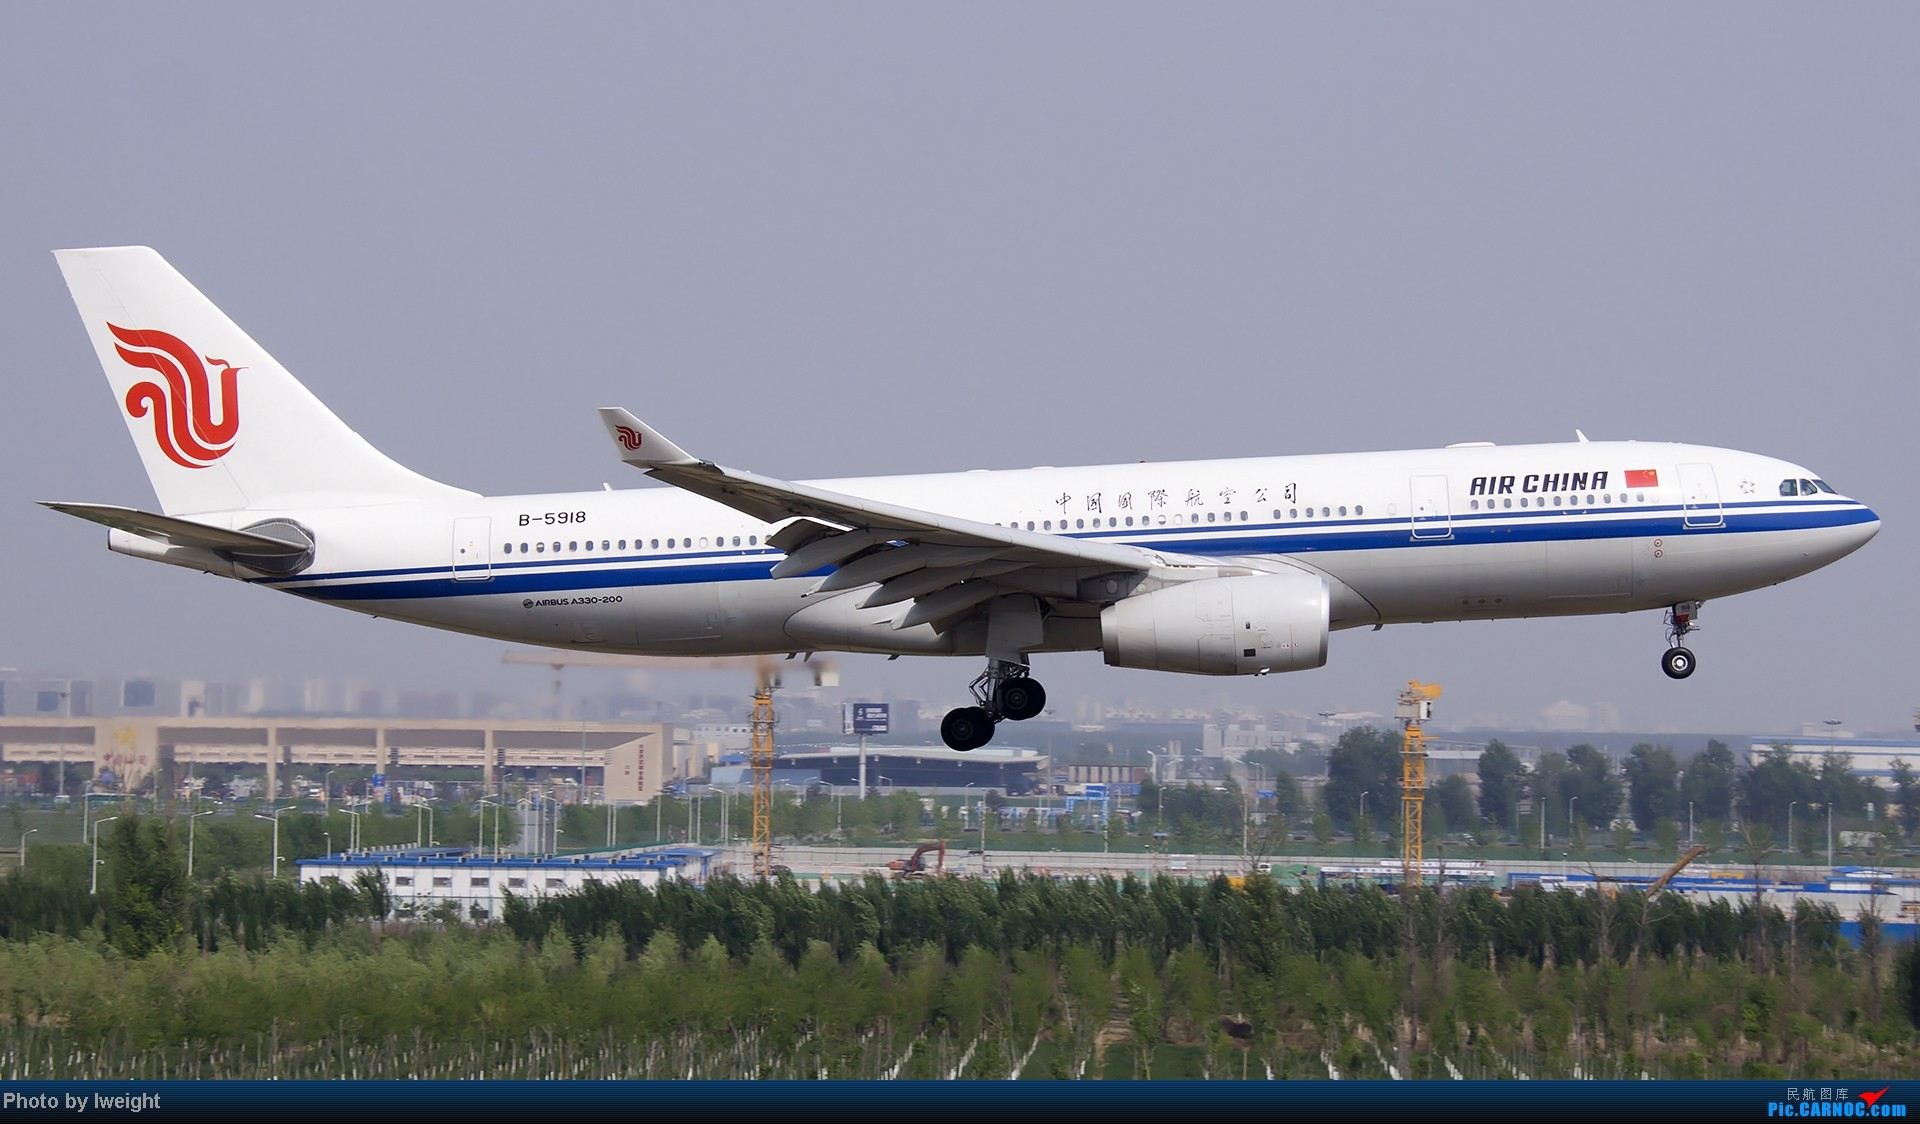 Re:[原创]错过了卡航的巴塞罗那号,只有这些大路货了,泪奔啊 AIRBUS A330-200 B-5918 中国北京首都机场